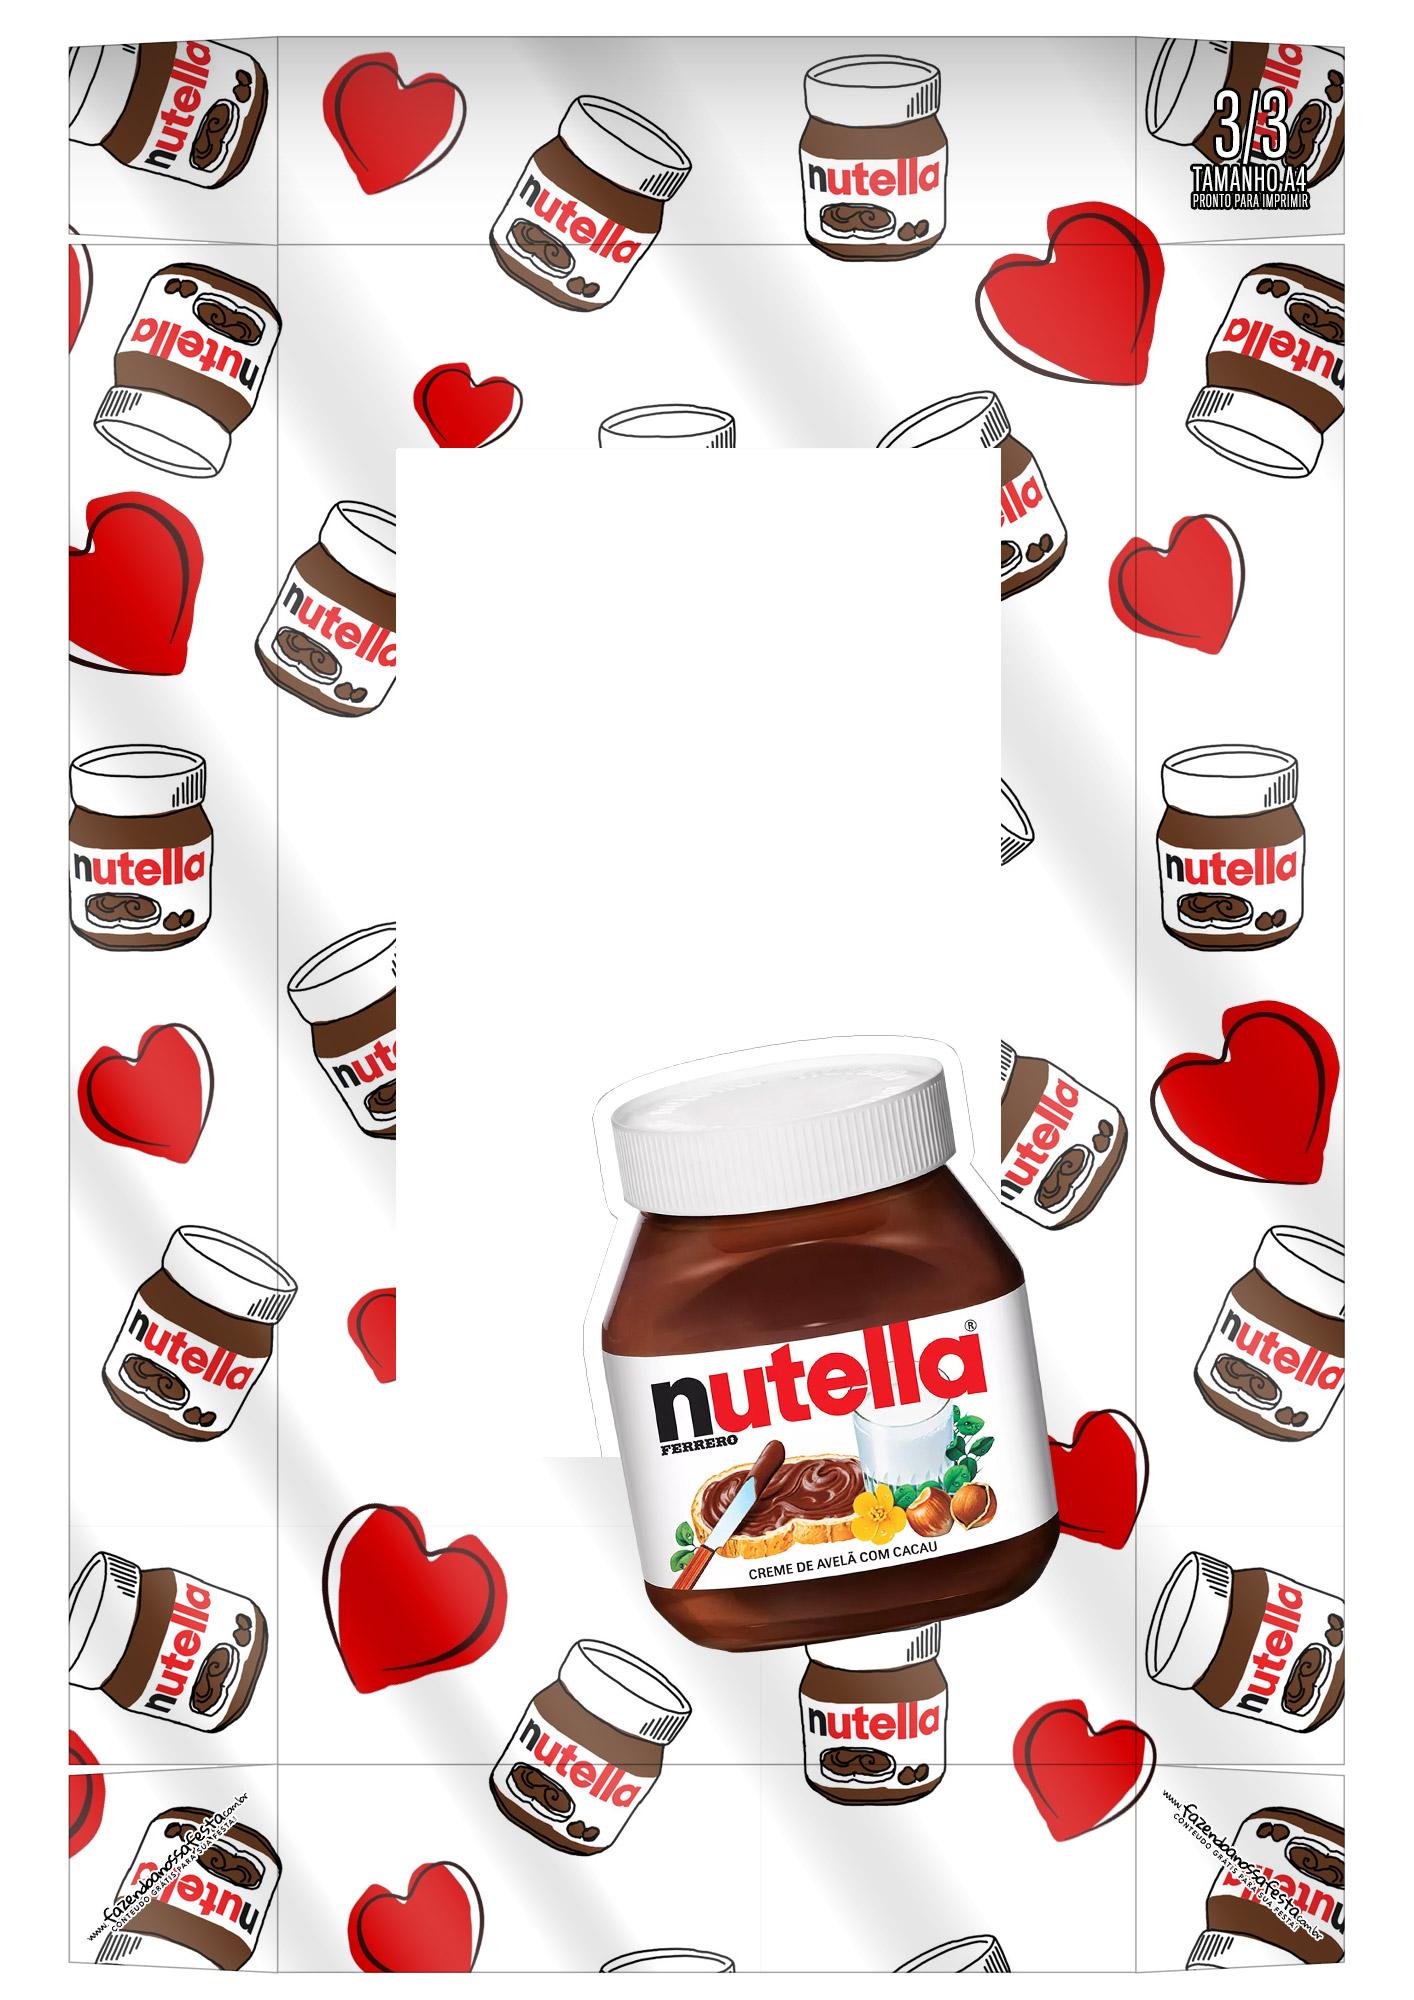 Caixa Kit Mini Confeiteiro Chocolates Nutella parte de cima